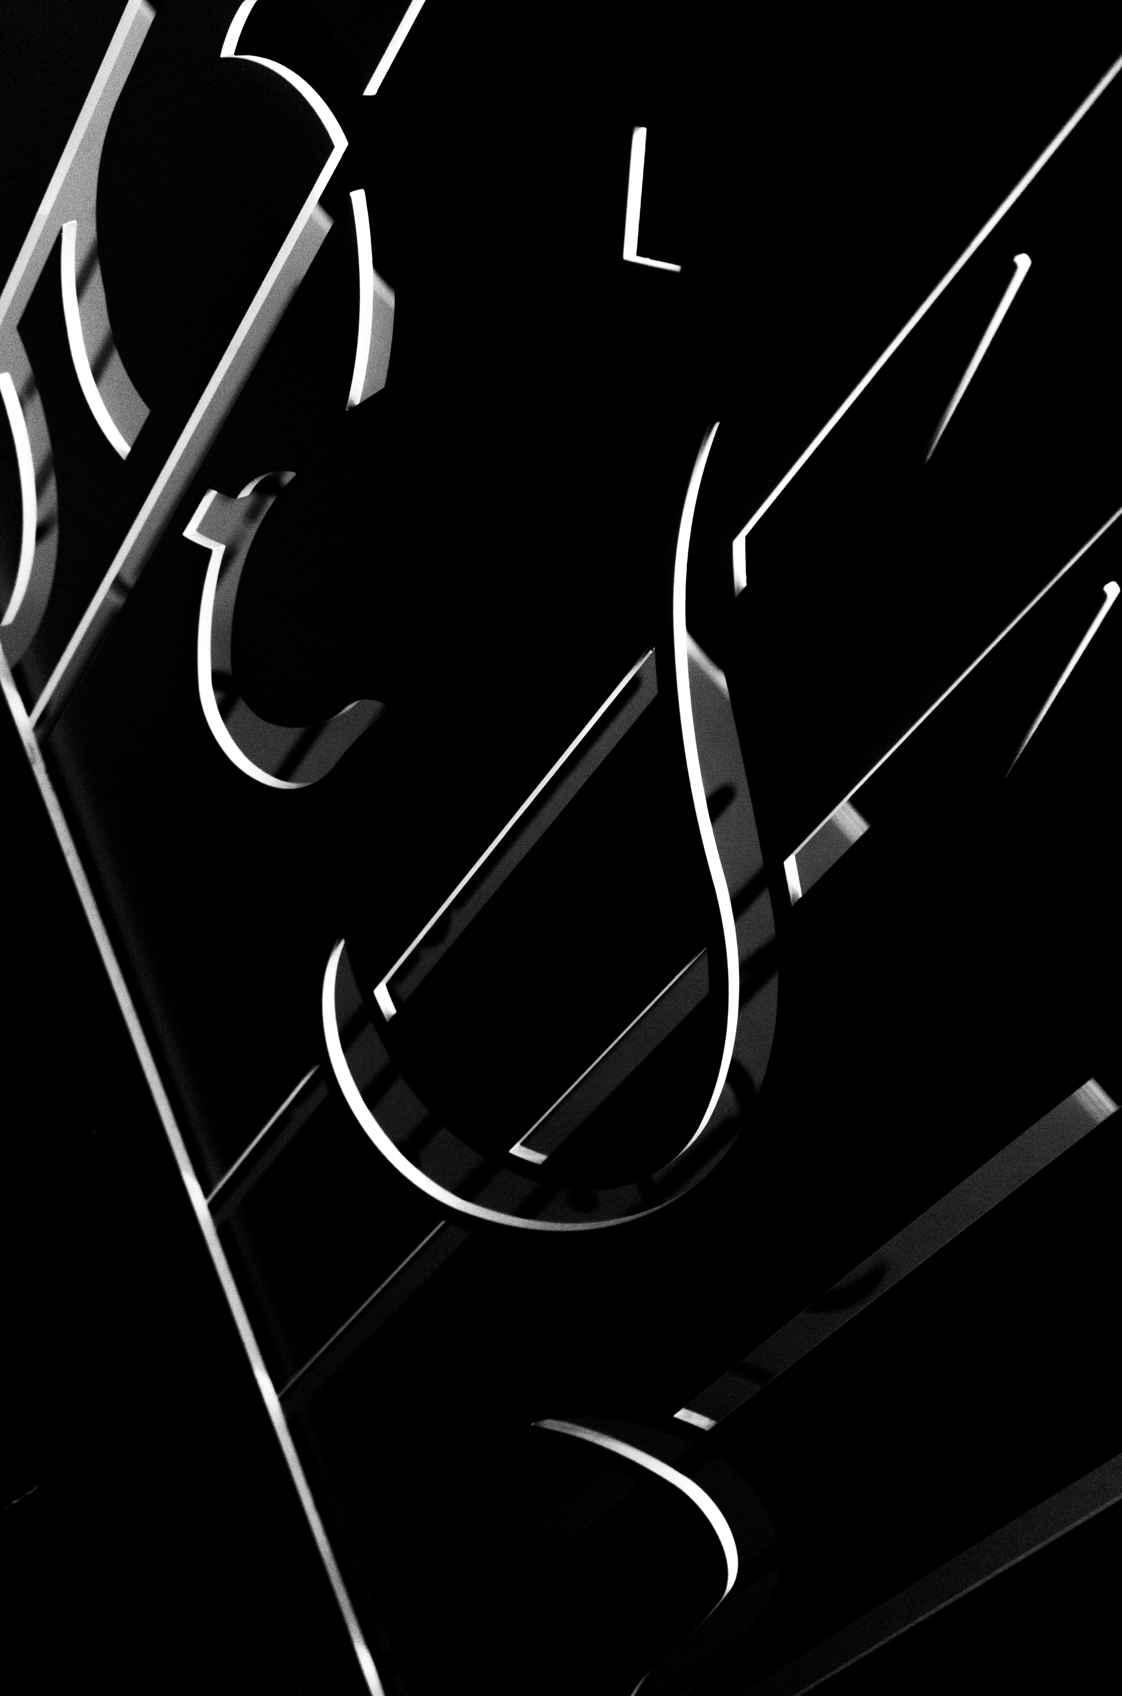 Untitled 4 by  Fern Nesson - Masterpiece Online